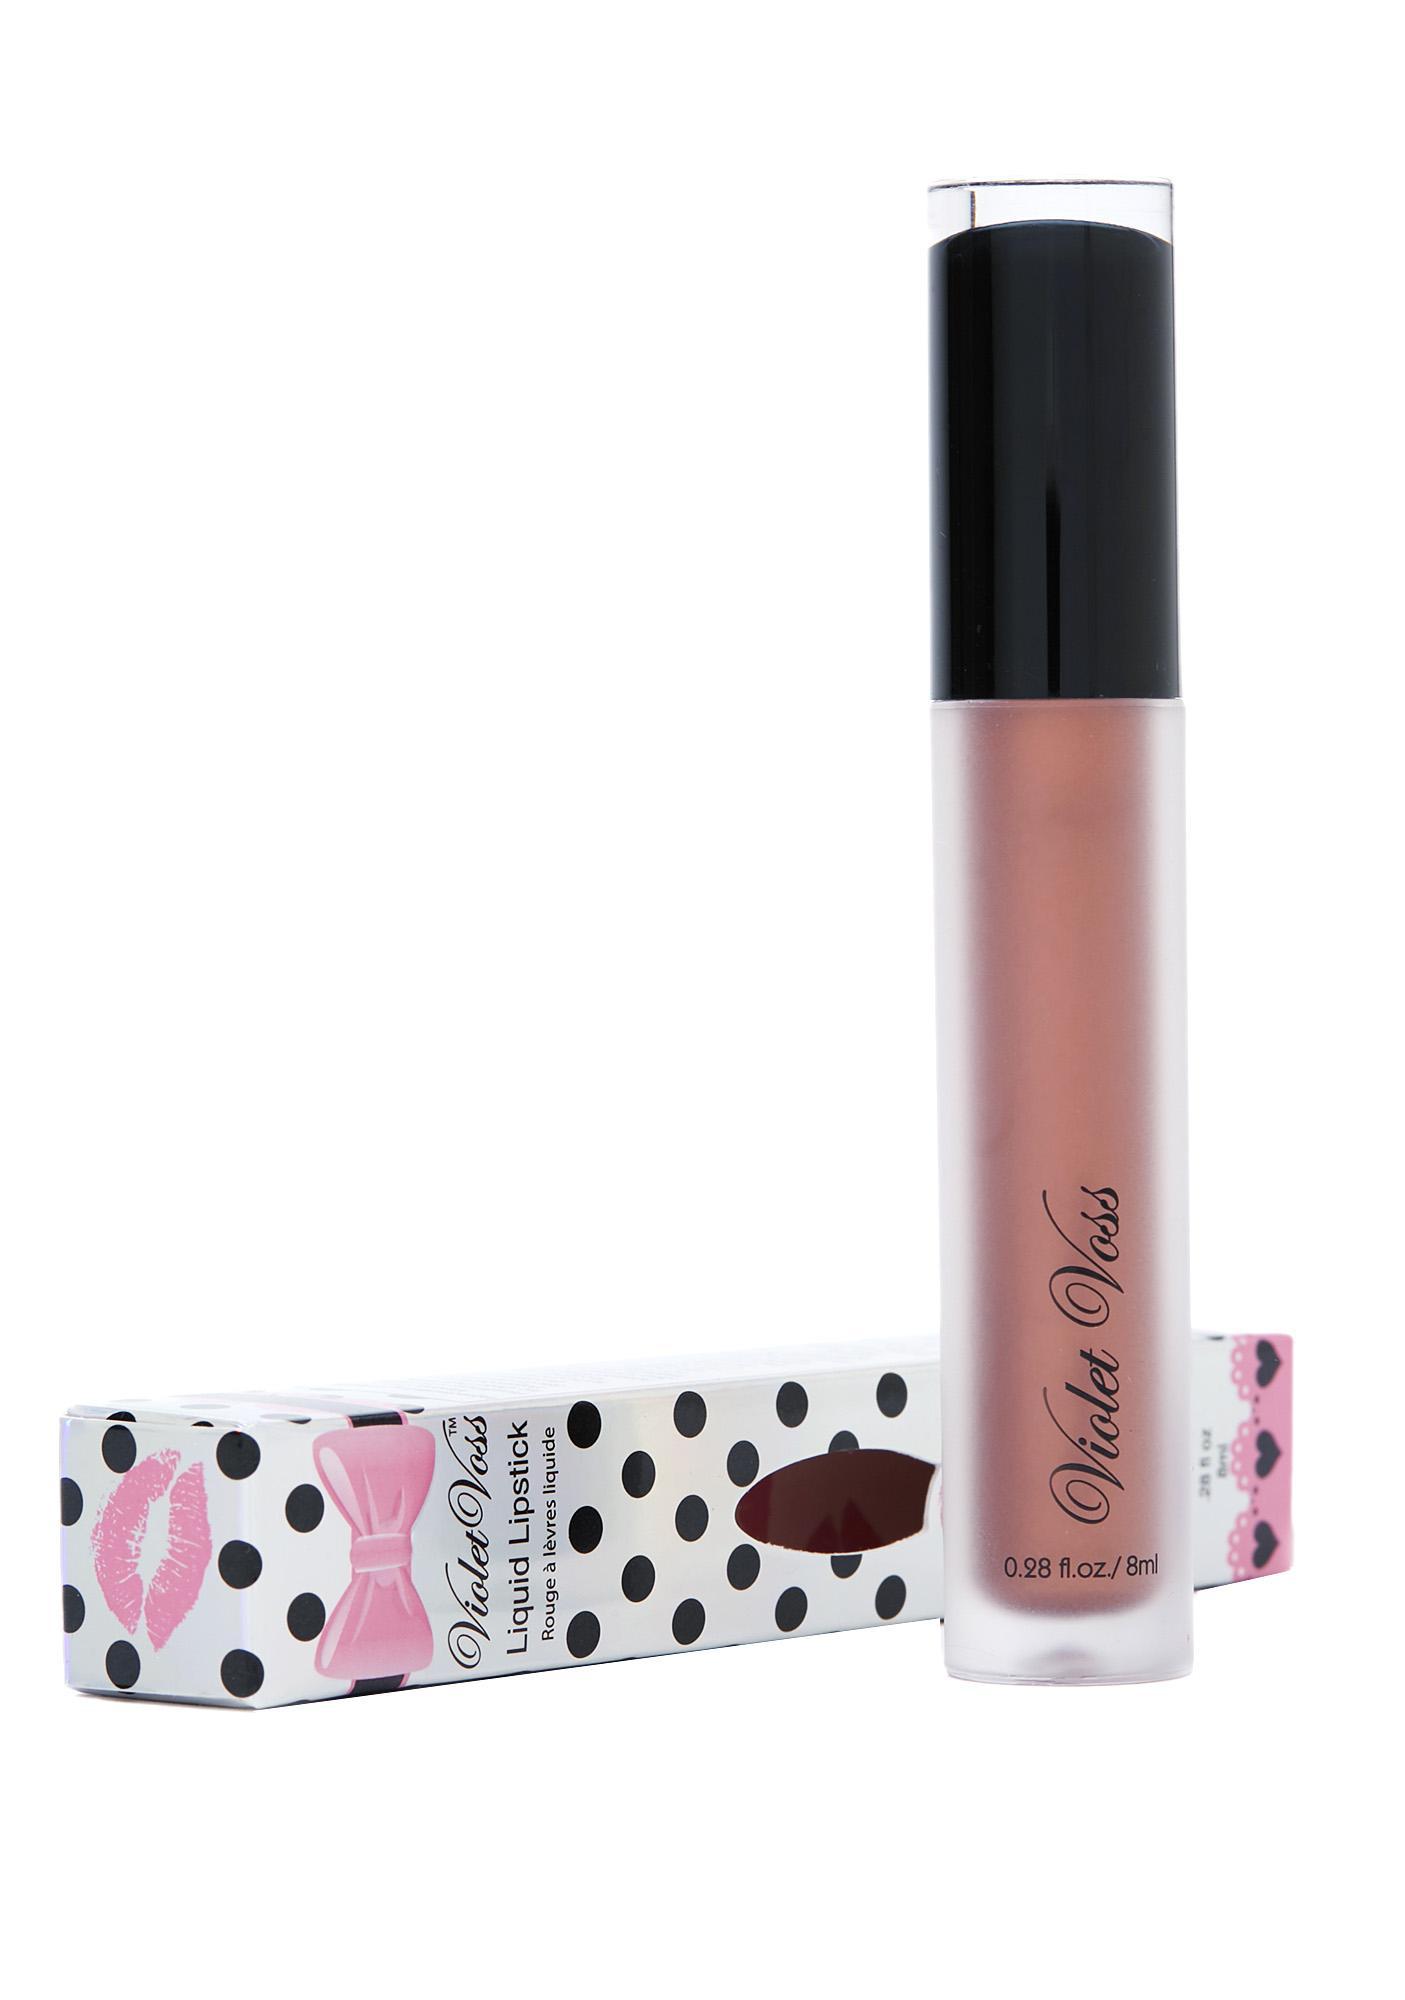 Violet Voss Current Mood Matte Liquid Lipstick